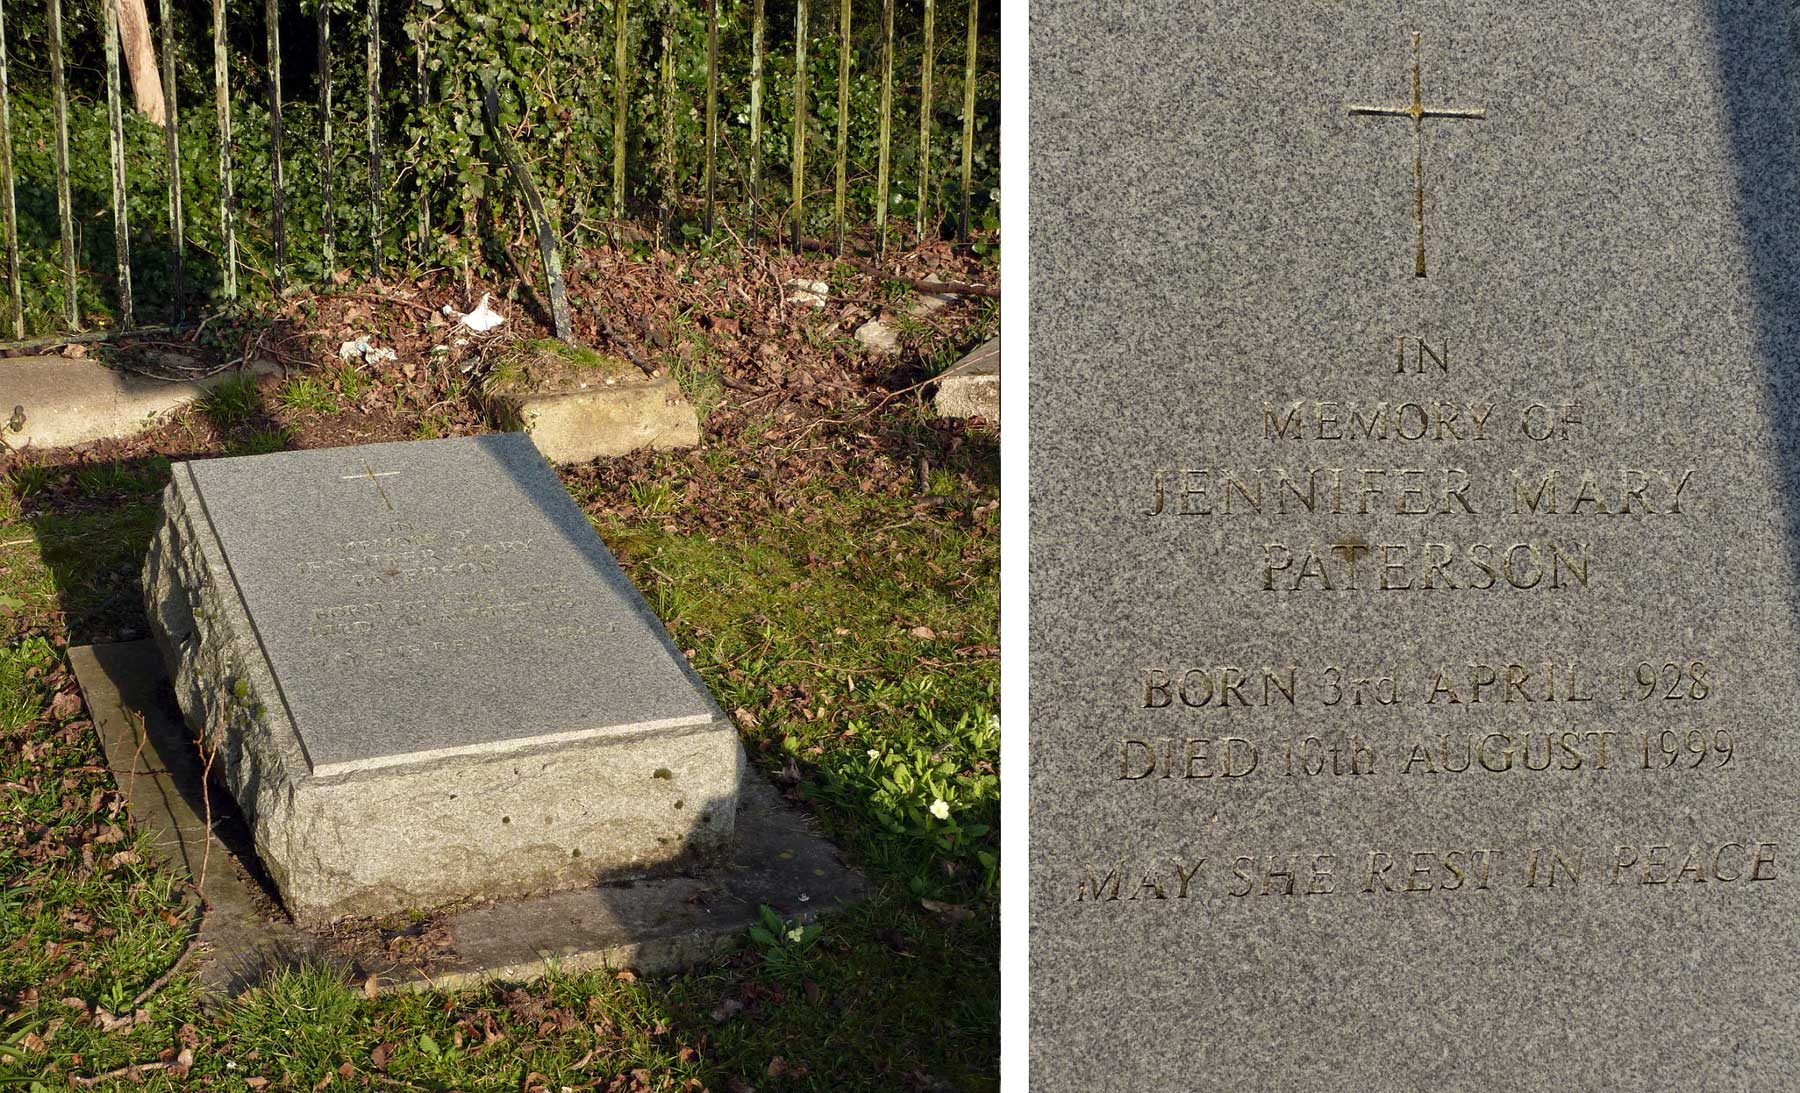 Jennifer Paterson grave